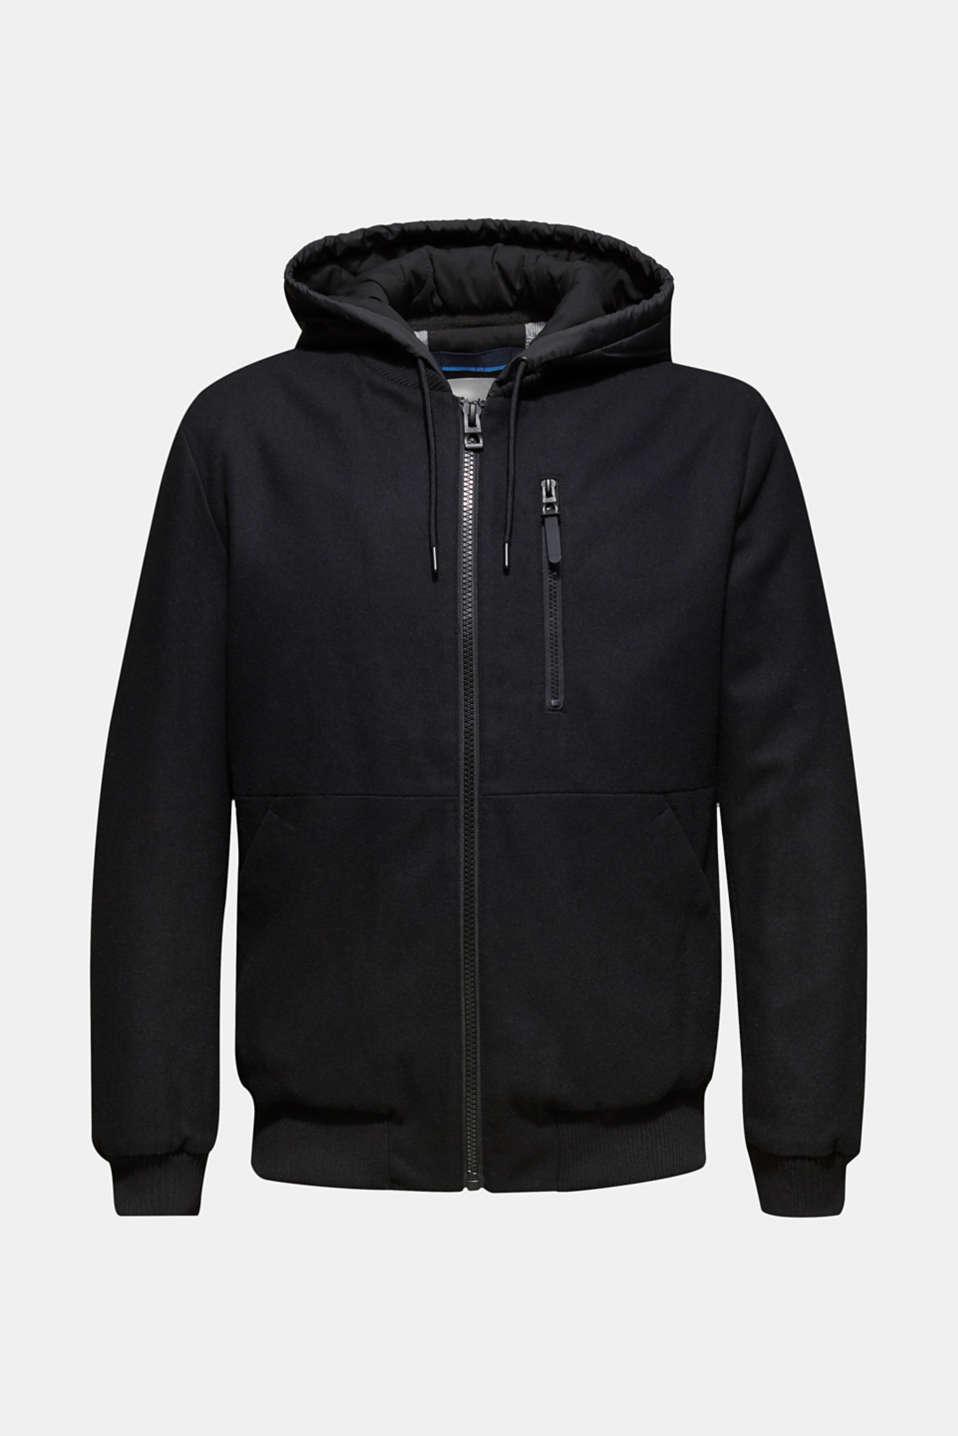 With wool: Jacket with adjustable hood, BLACK, detail image number 7